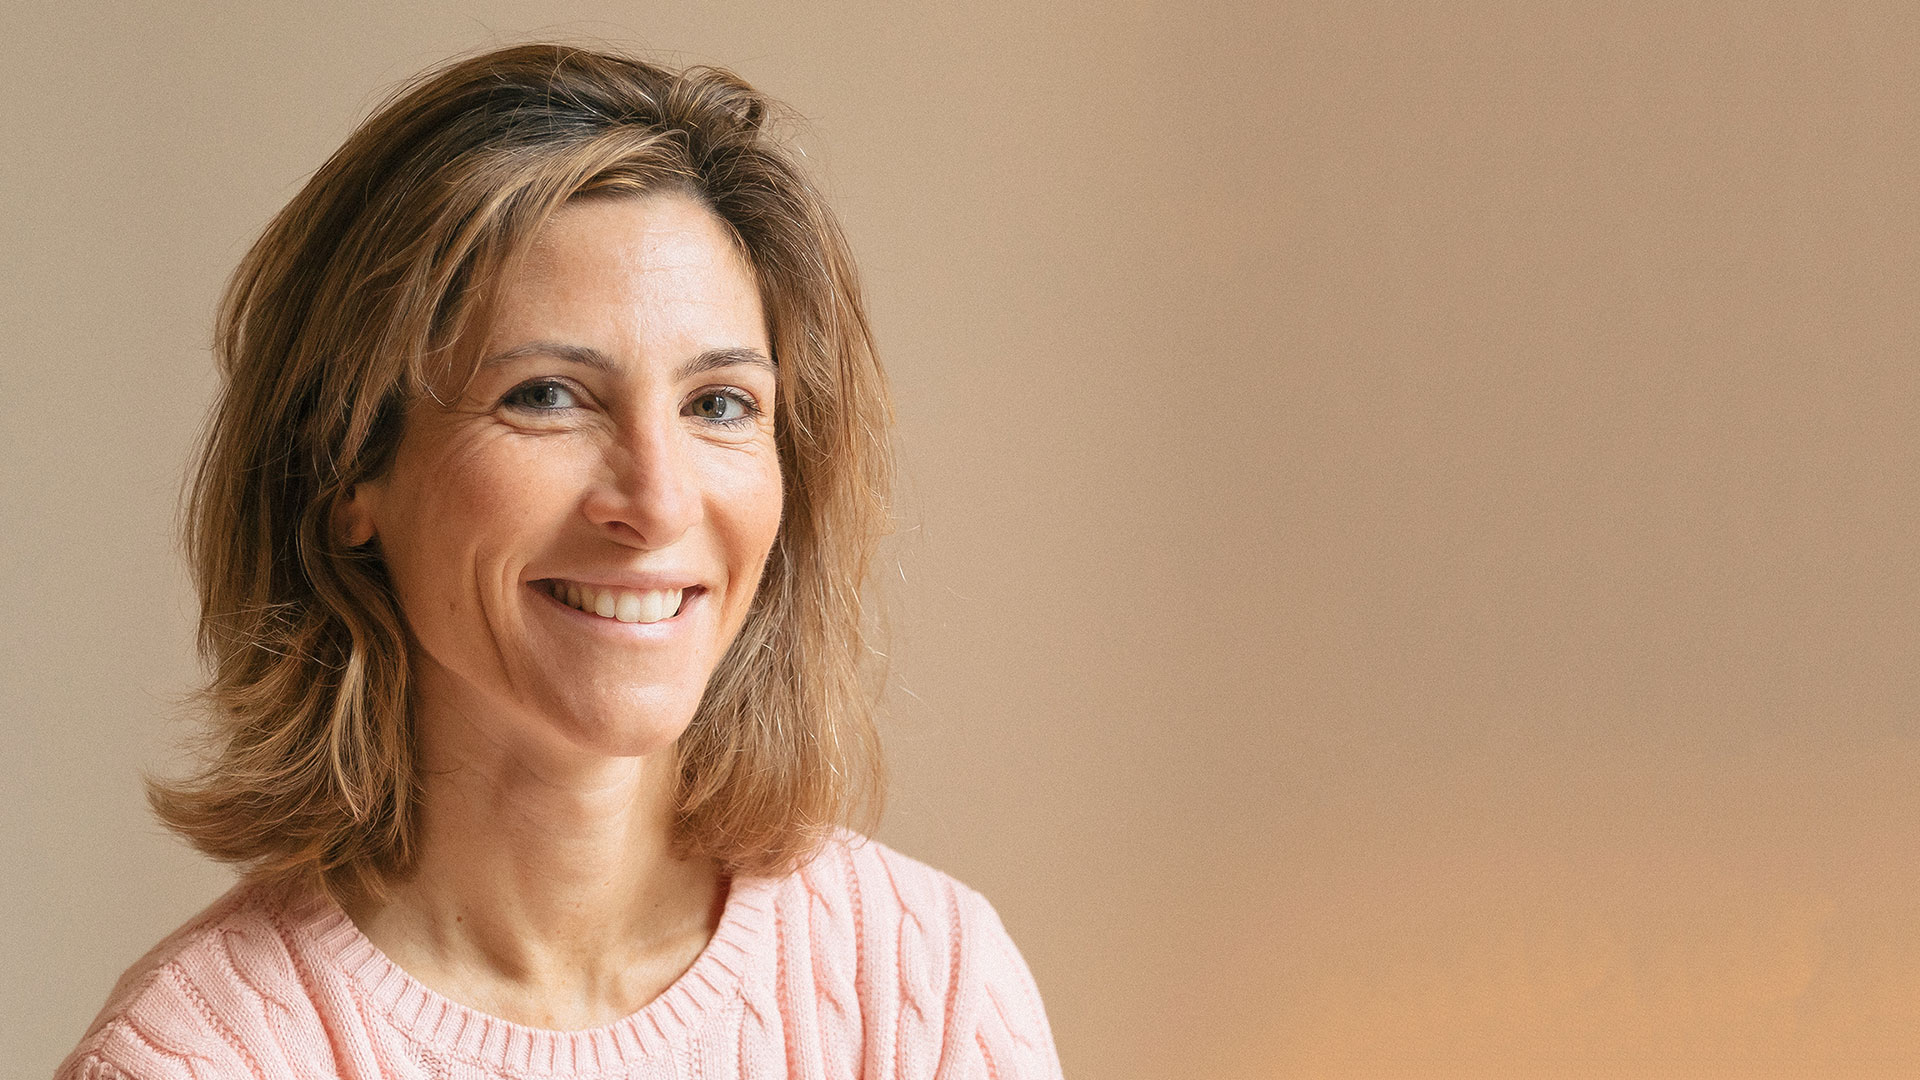 Julia-de-Funes-biographie